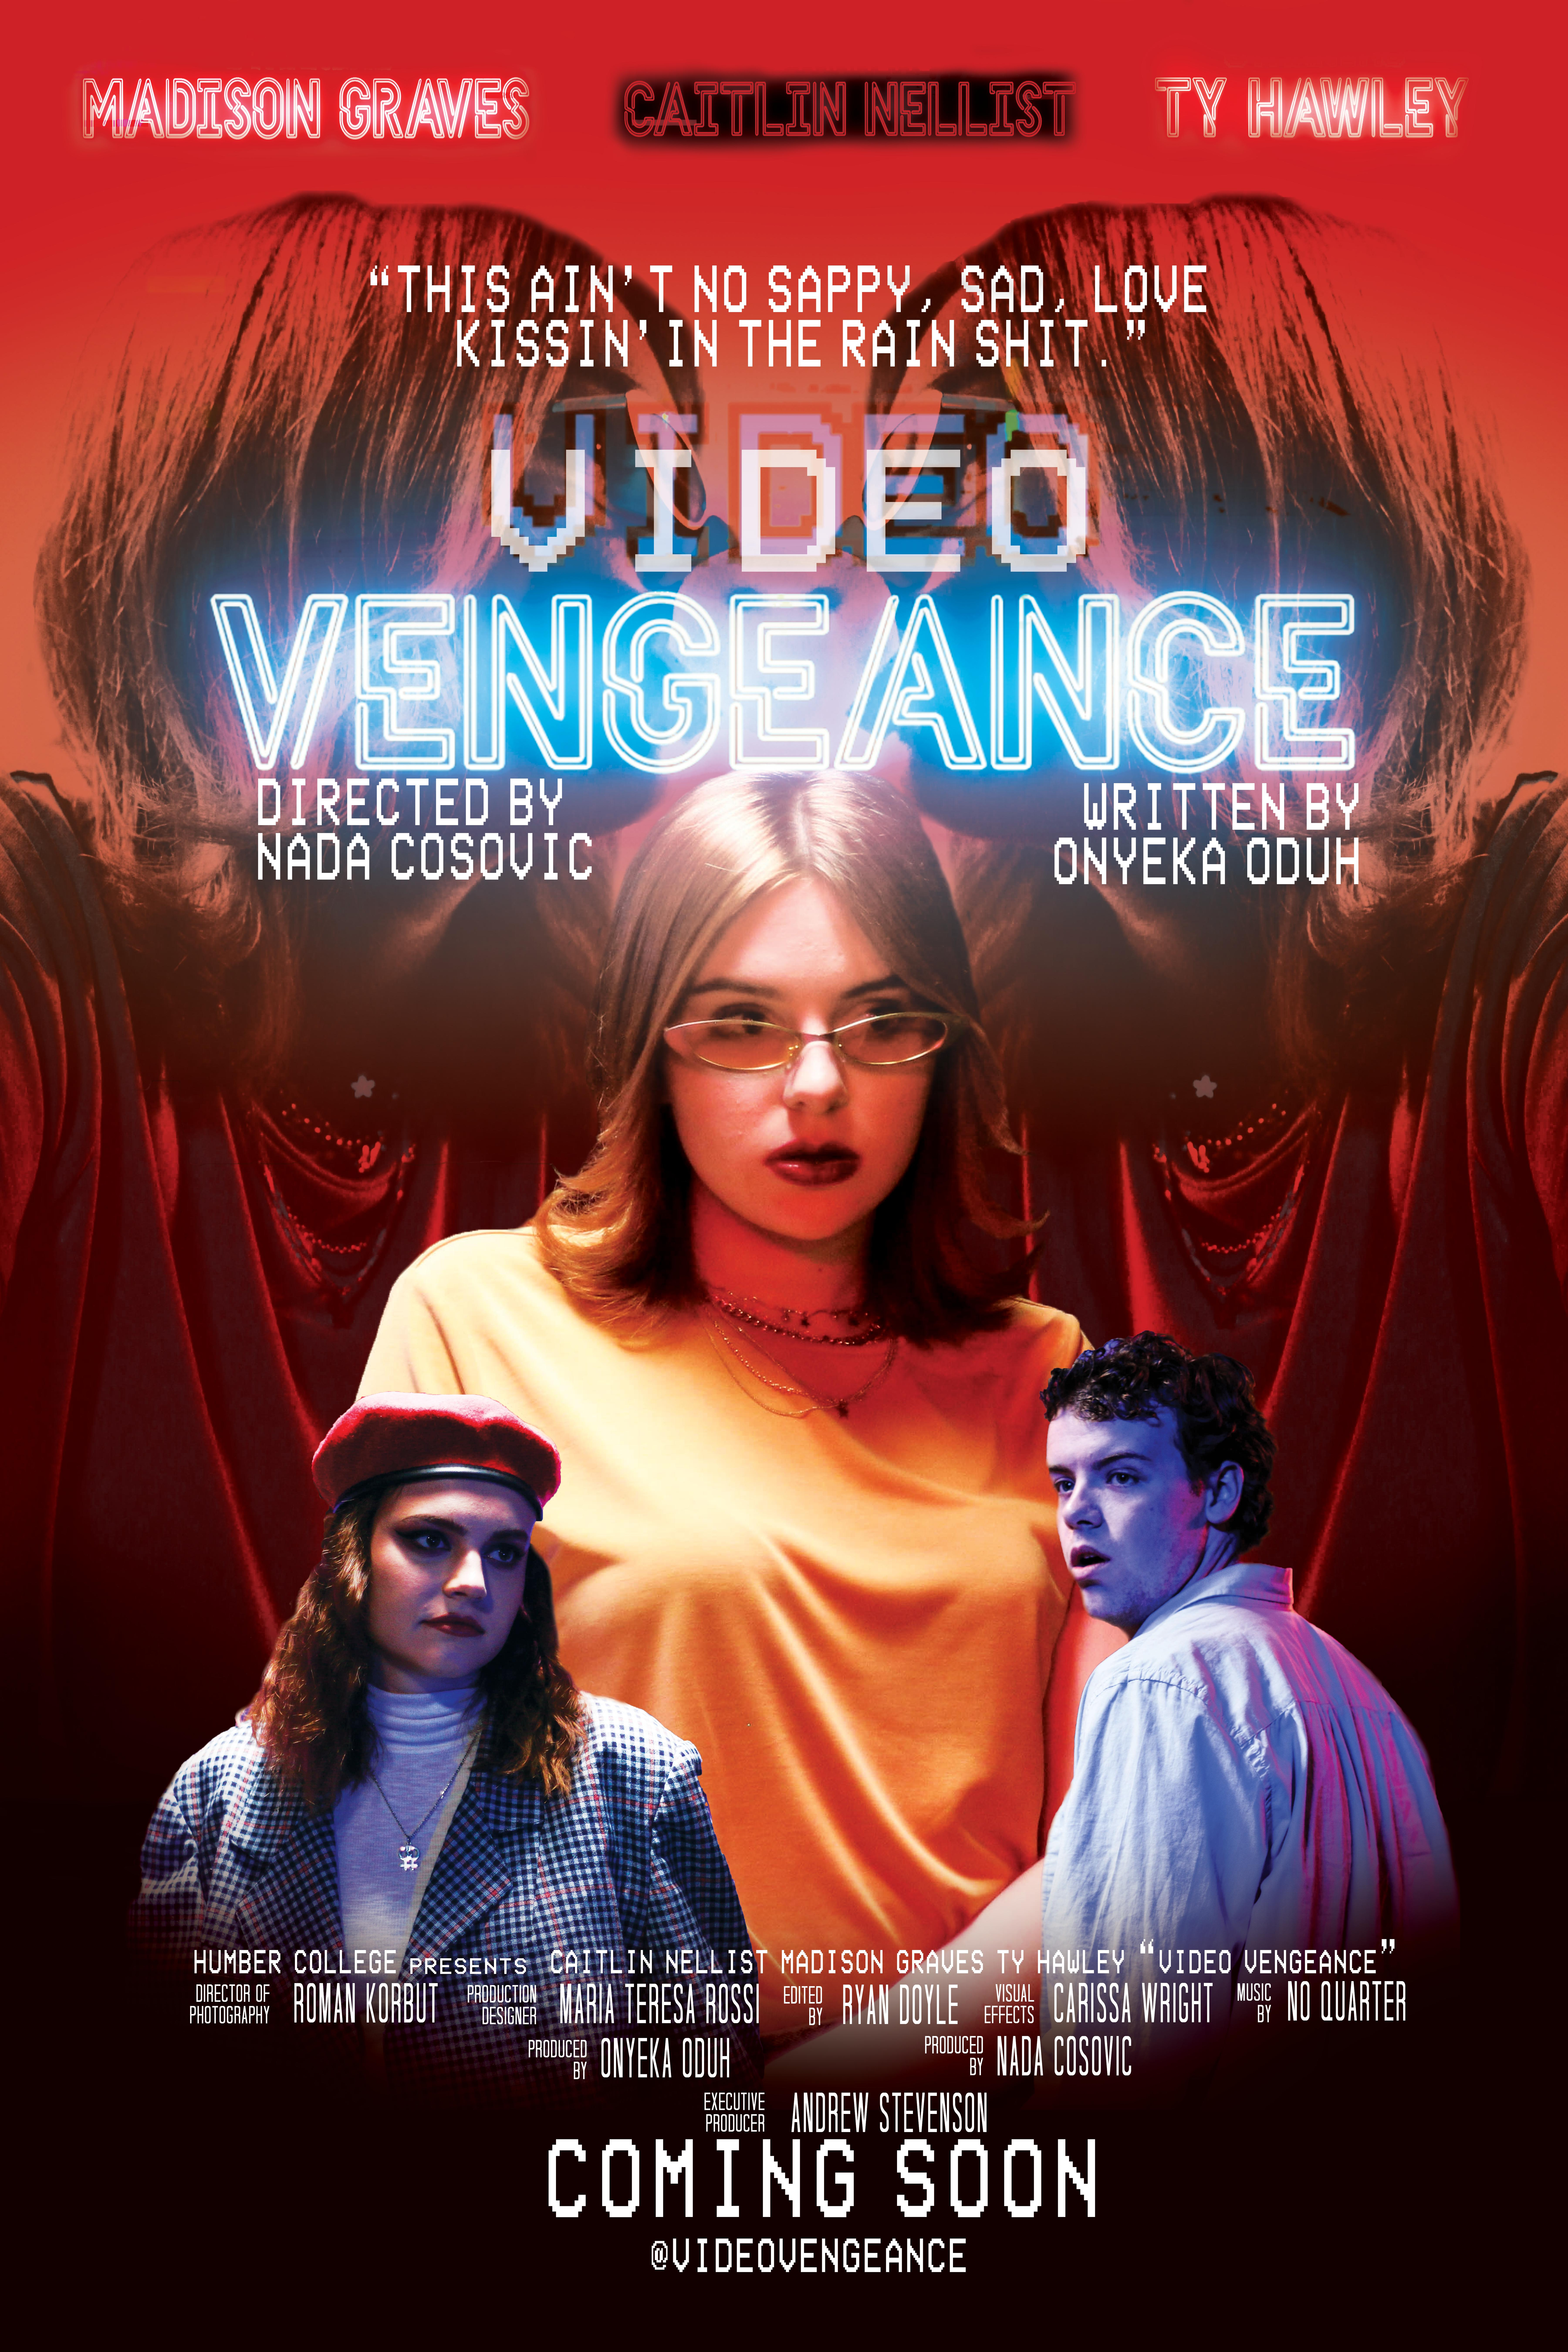 Video Vengeance